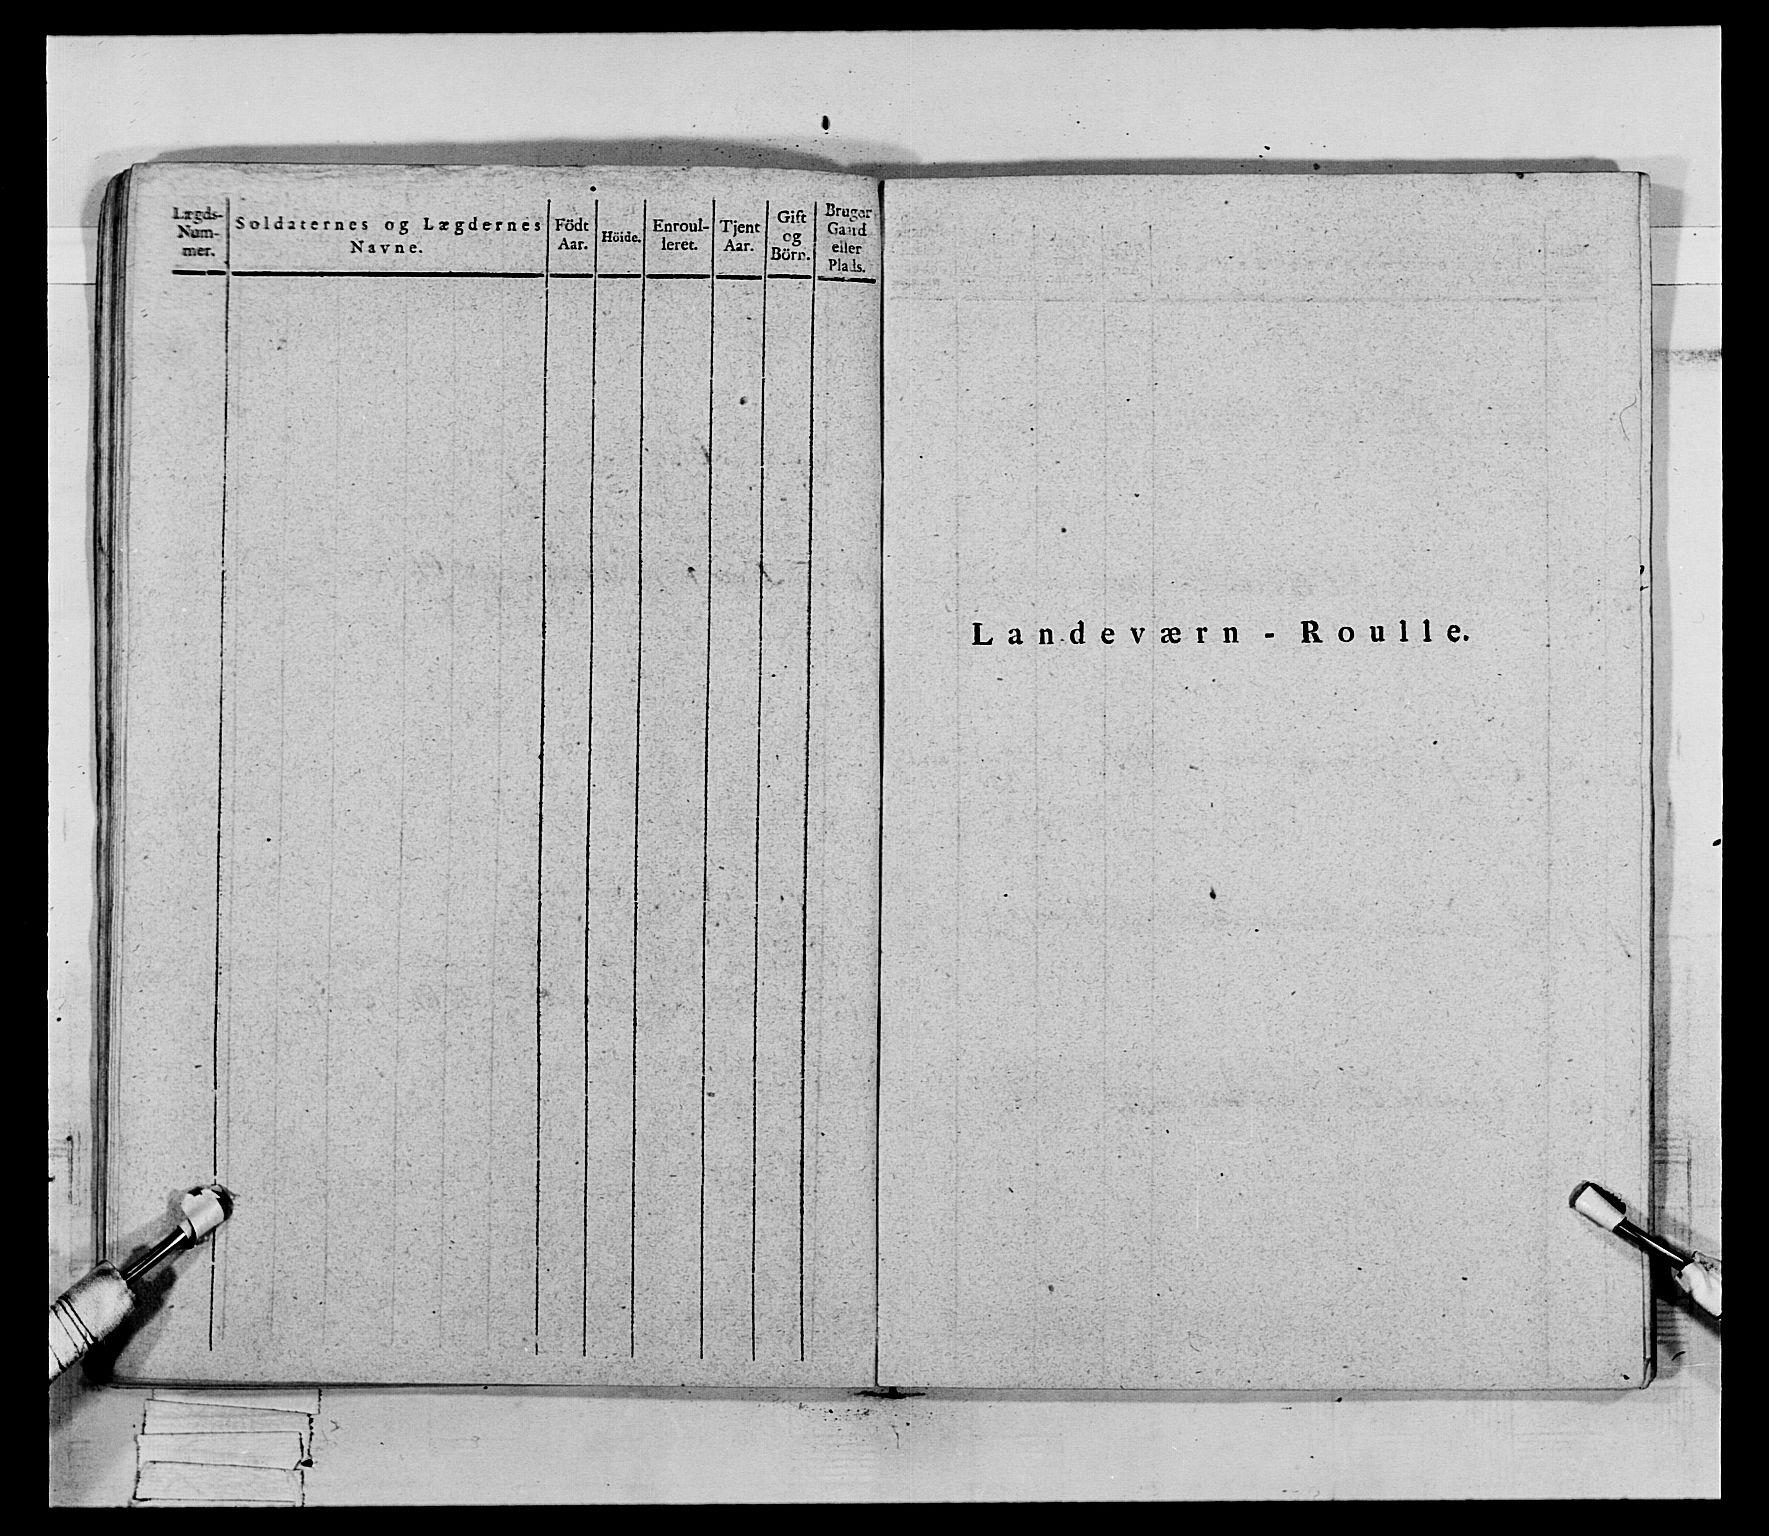 RA, Generalitets- og kommissariatskollegiet, Det kongelige norske kommissariatskollegium, E/Eh/L0069: Opplandske gevorbne infanteriregiment, 1810-1818, s. 691